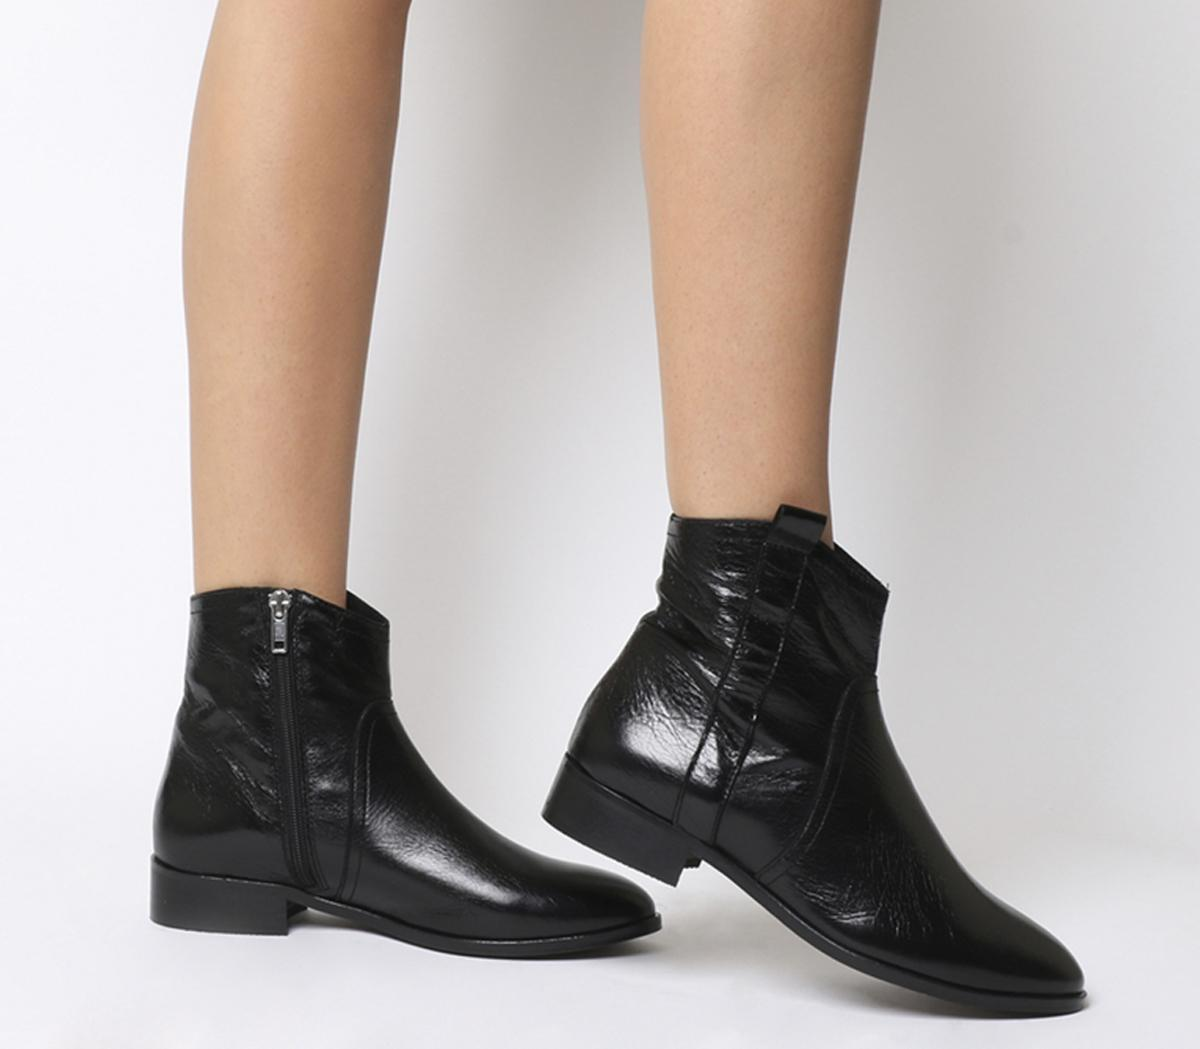 Office Amuse Western Flat Boots Black